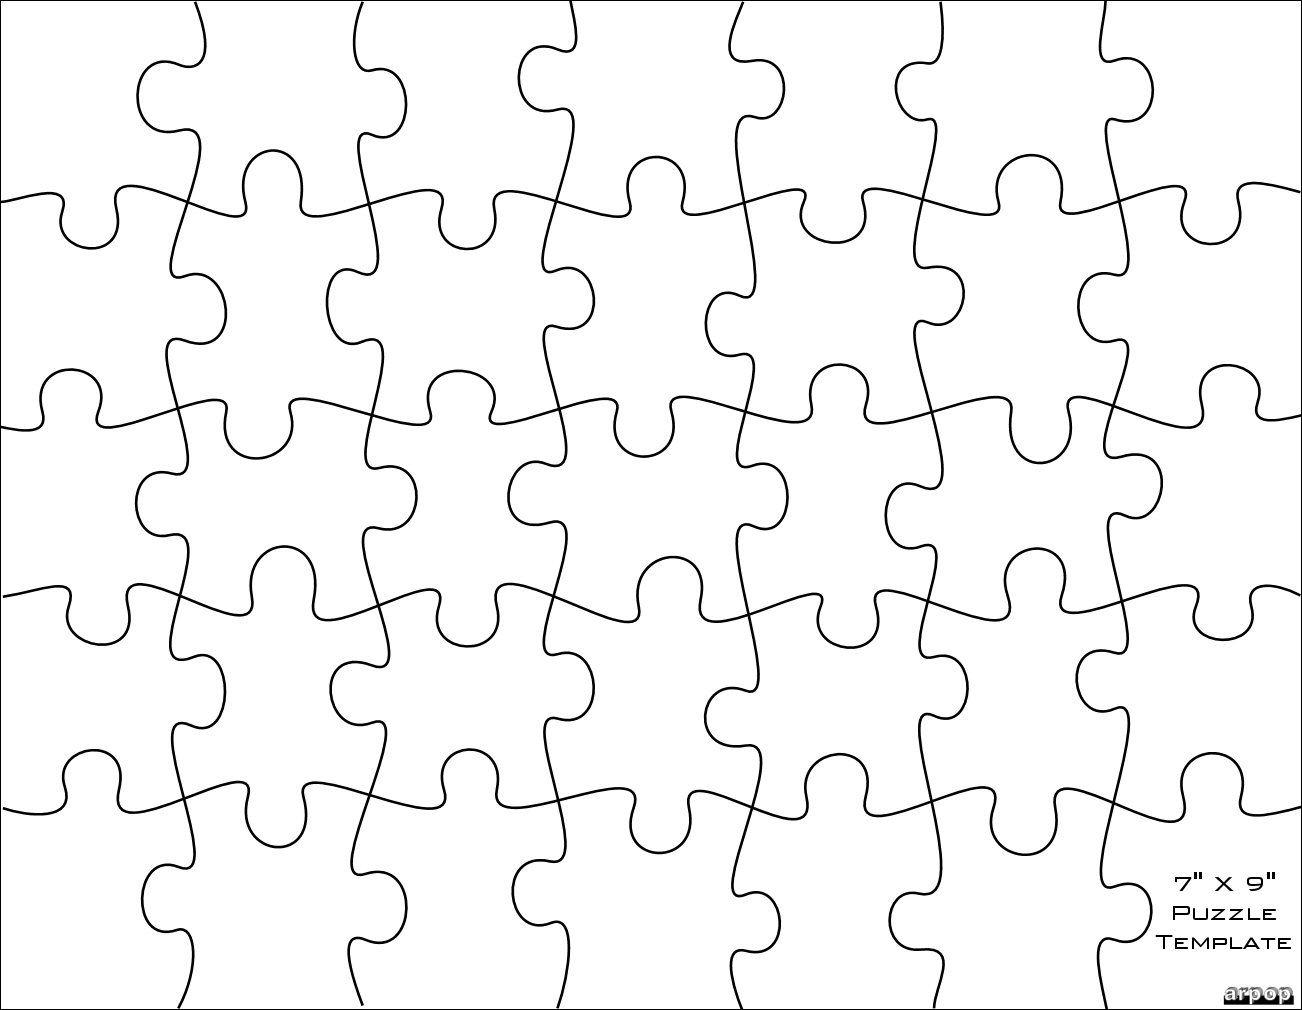 Free Scroll Saw Patternsarpop: Jigsaw Puzzle Templates | School - Printable Custom Puzzle